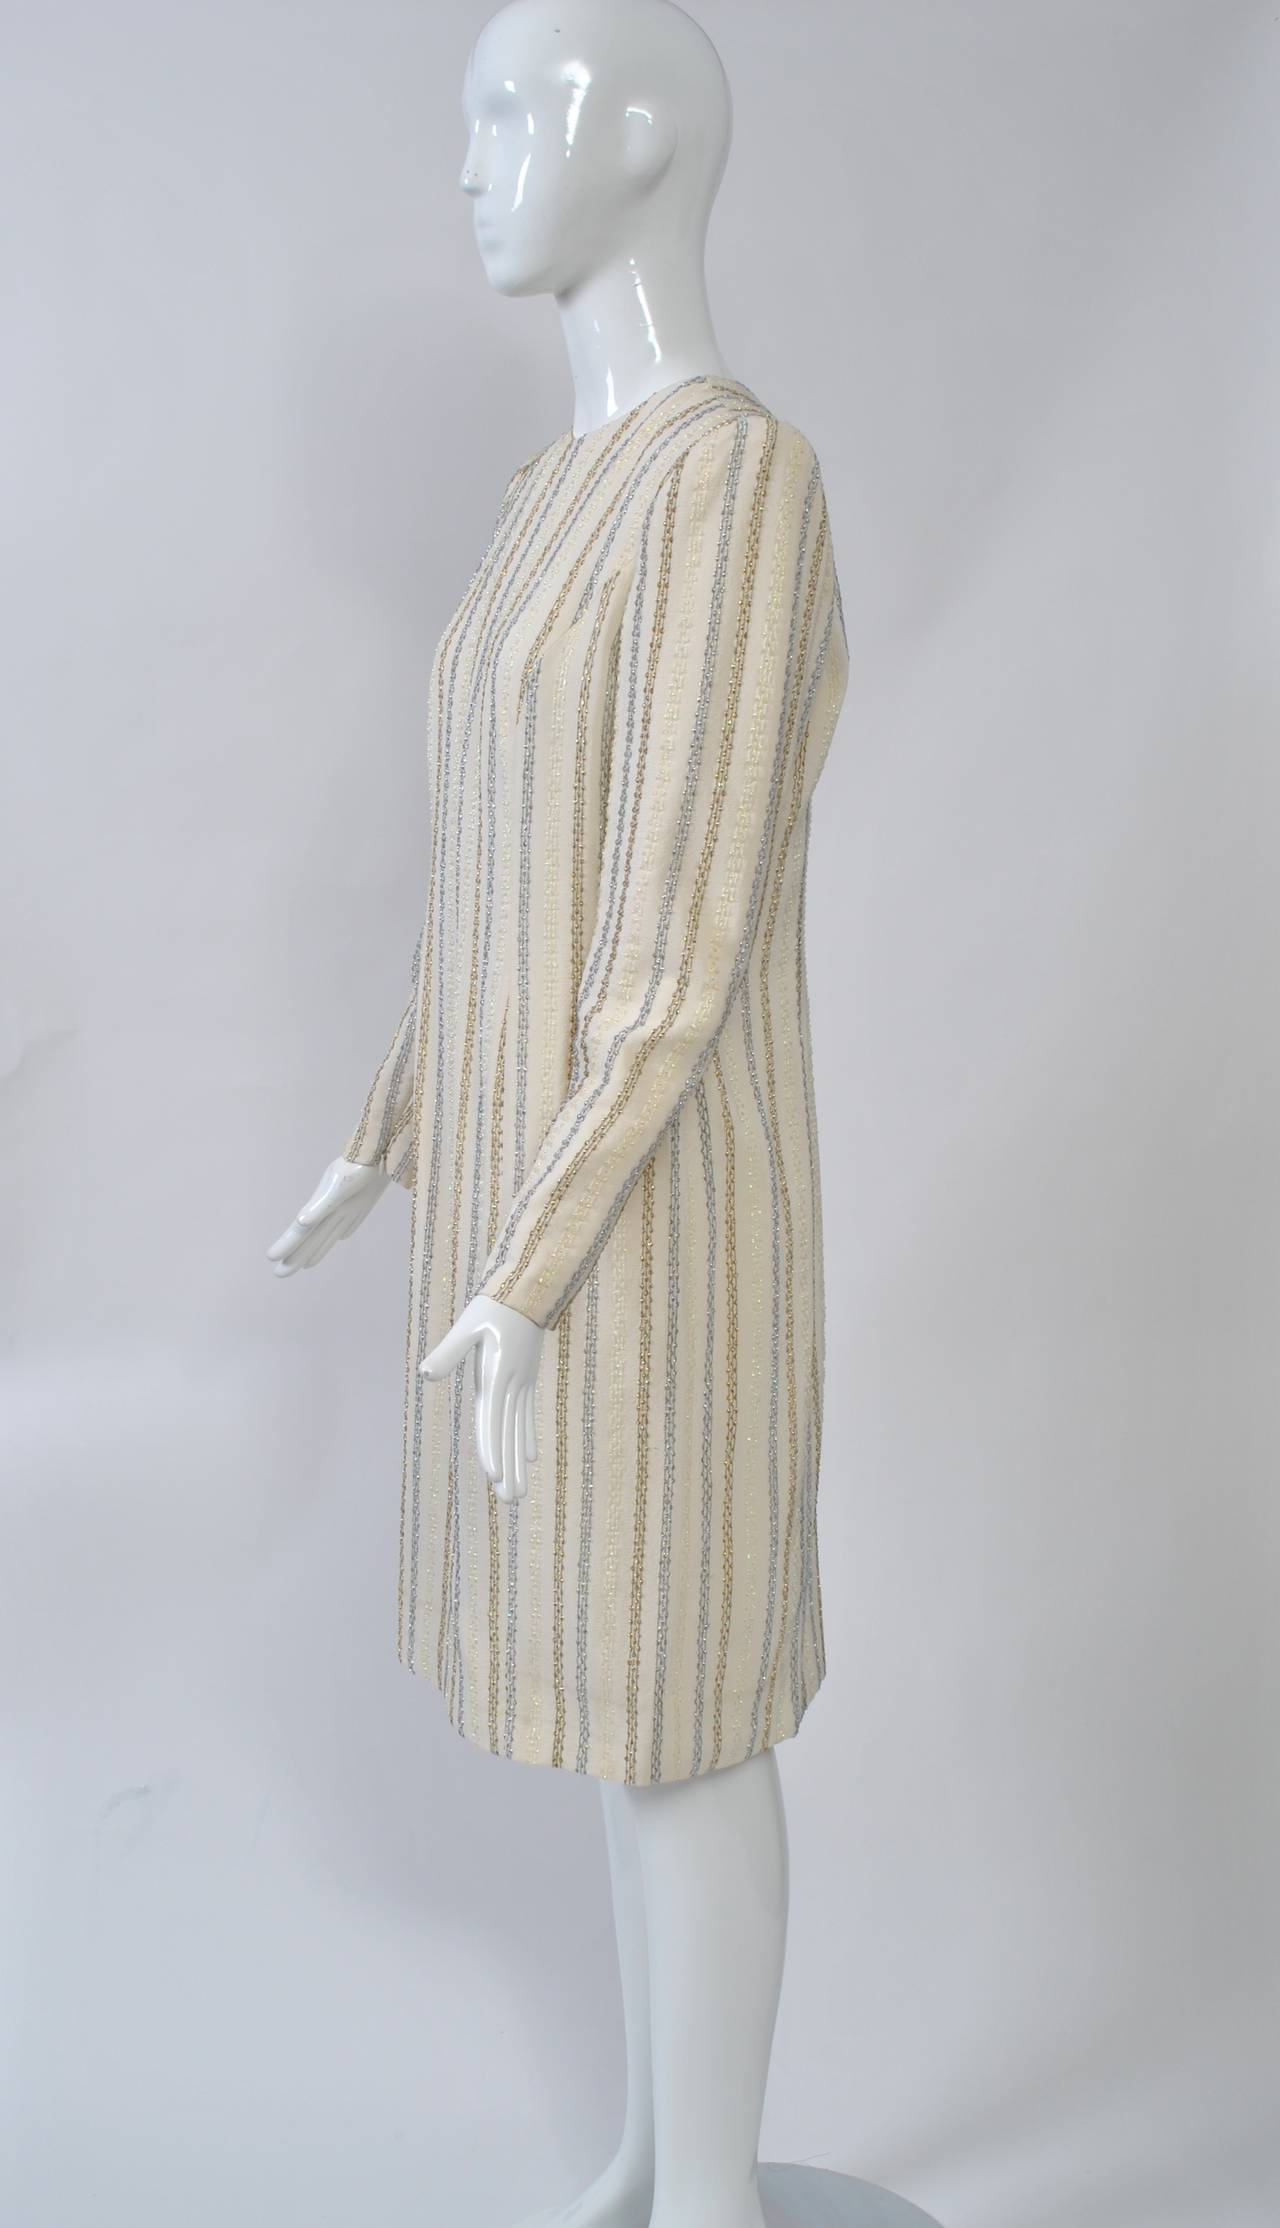 Carolina Herrera Ivory and Metallic Dress 3